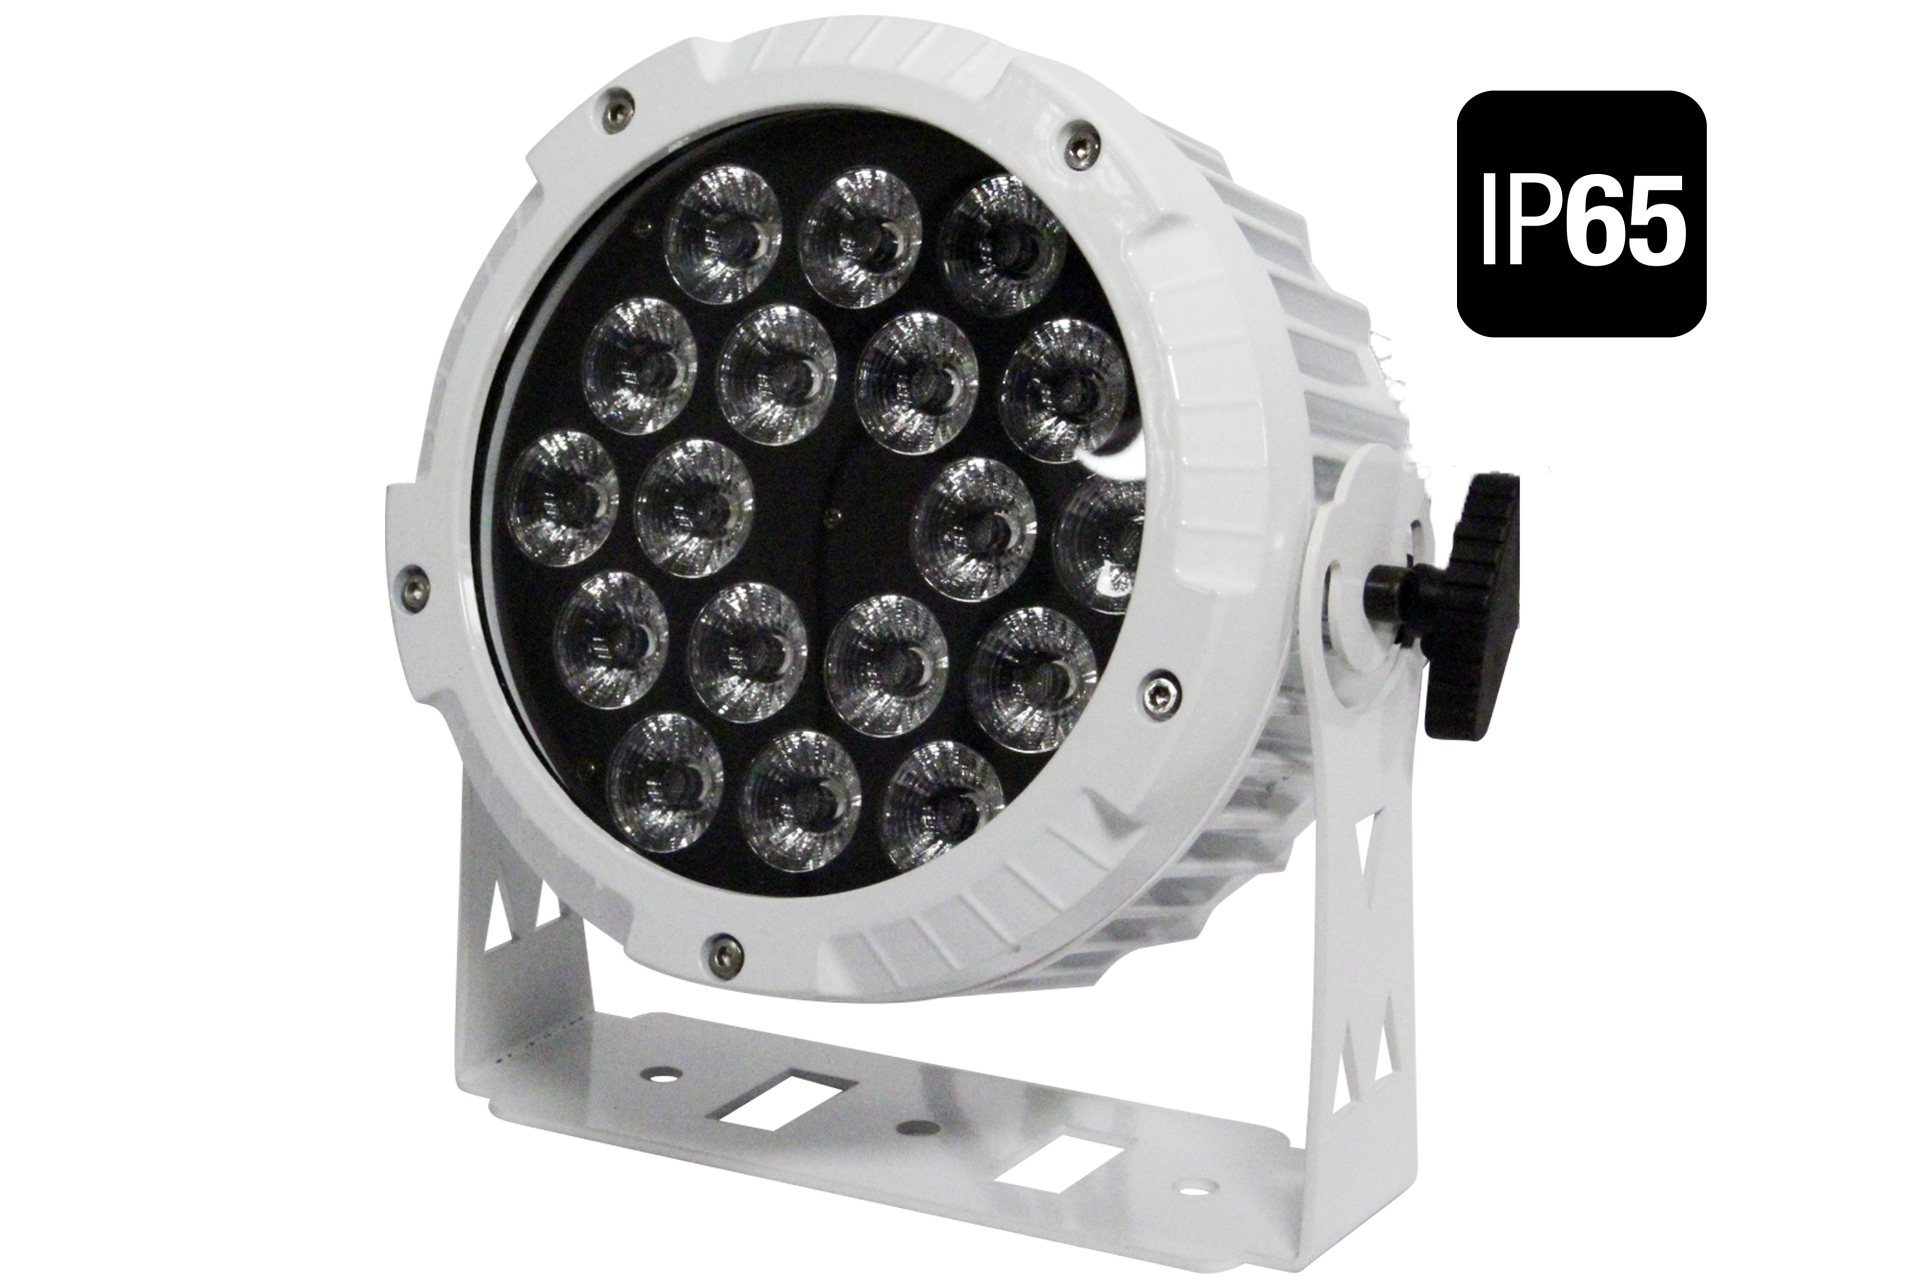 FOS-Par-18x10WPRO-IP65-Pearl_1.jpg